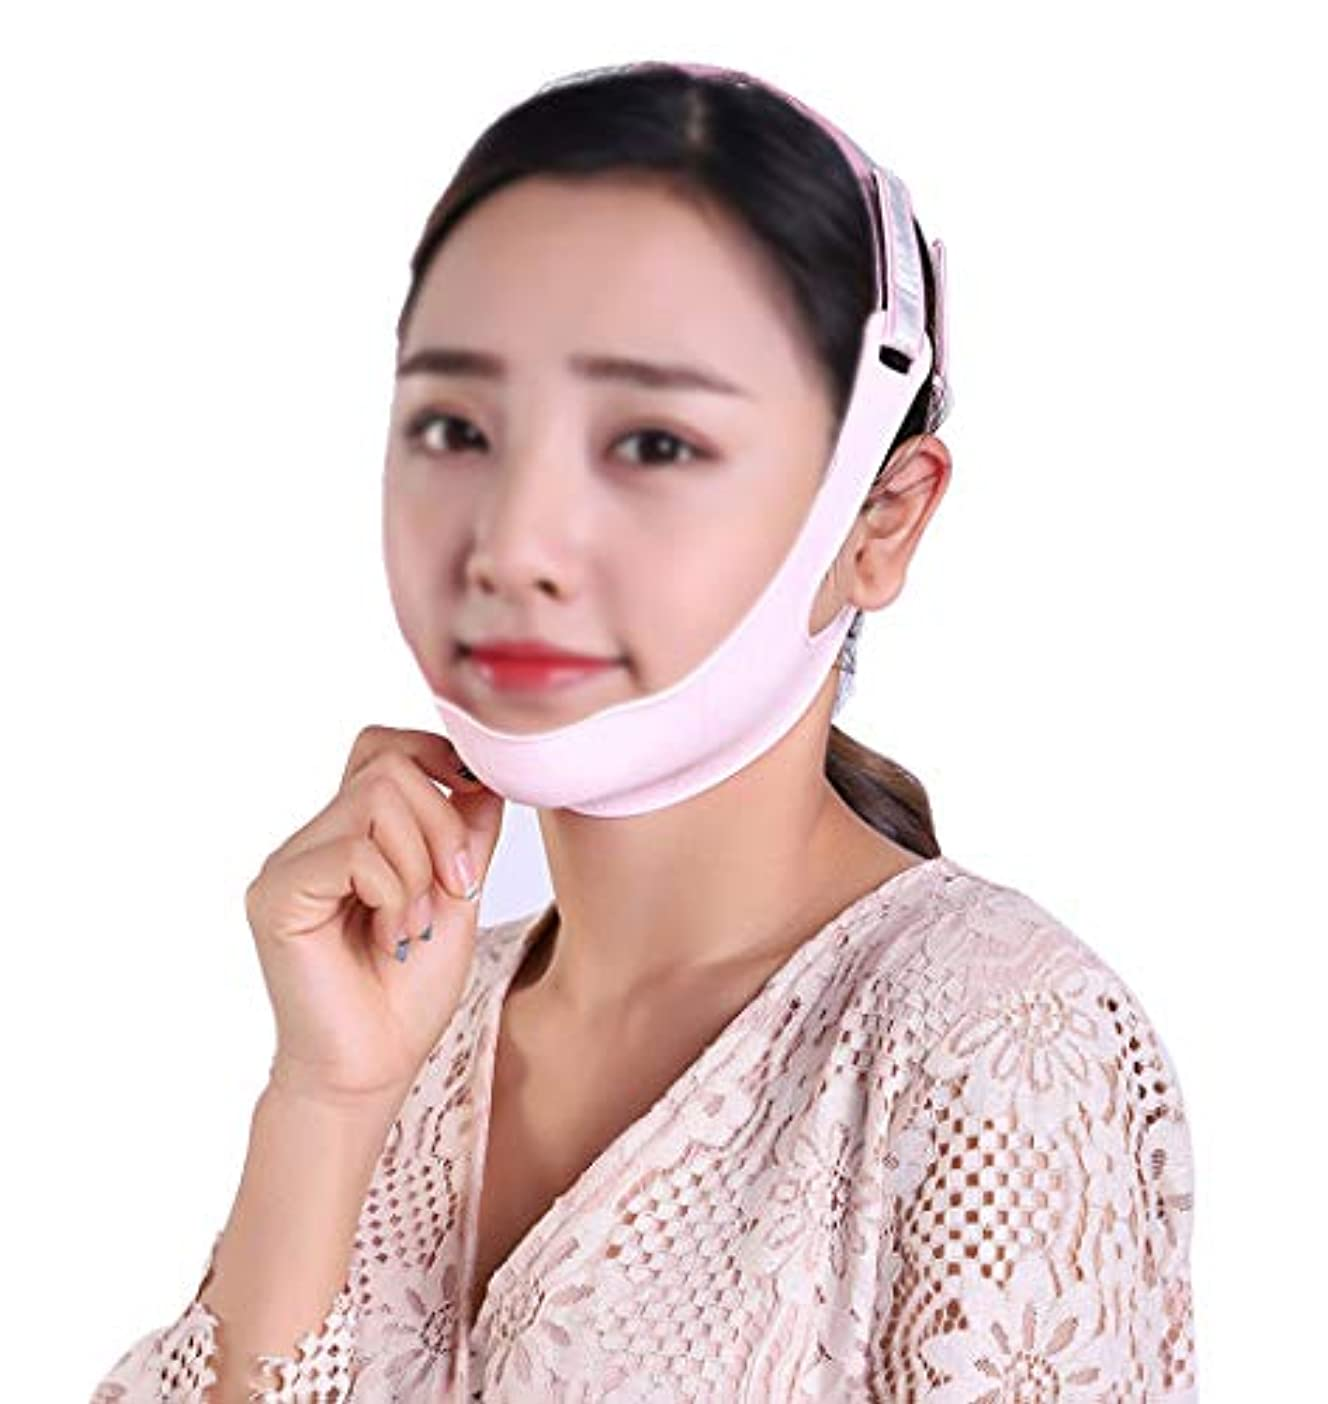 TLMY フェイシャルリフティングマスクシリコンVマスク引き締めフェイシャル包帯スモールVフェイスアーティファクト防止リラクゼーションフェイシャル&ネックリフティング 顔用整形マスク (Size : M)